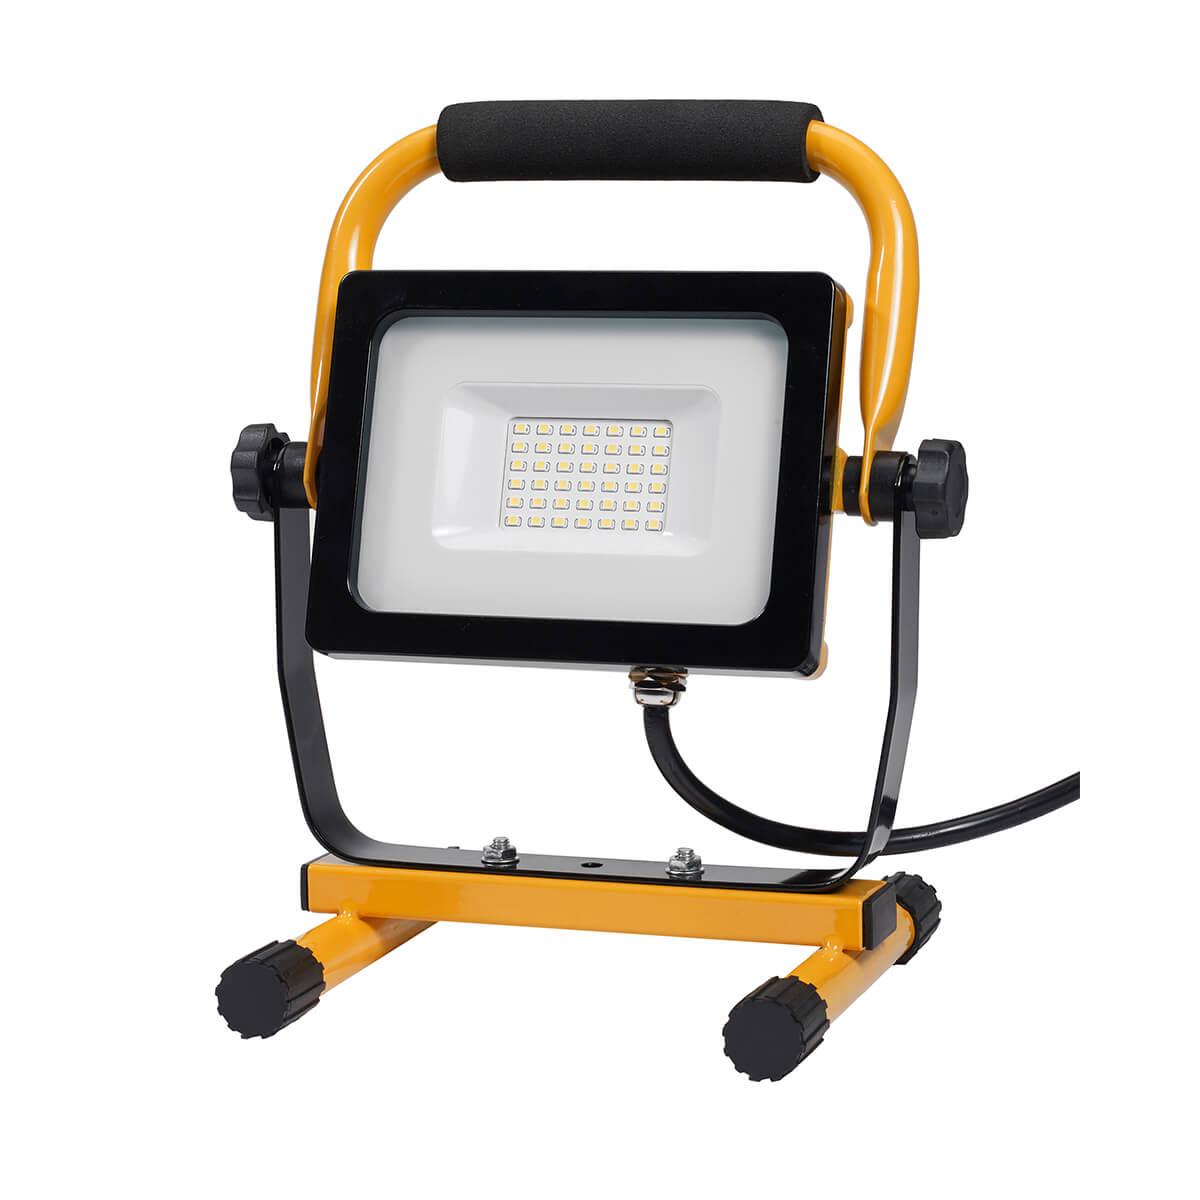 Worklight - 30W - 3000 lum